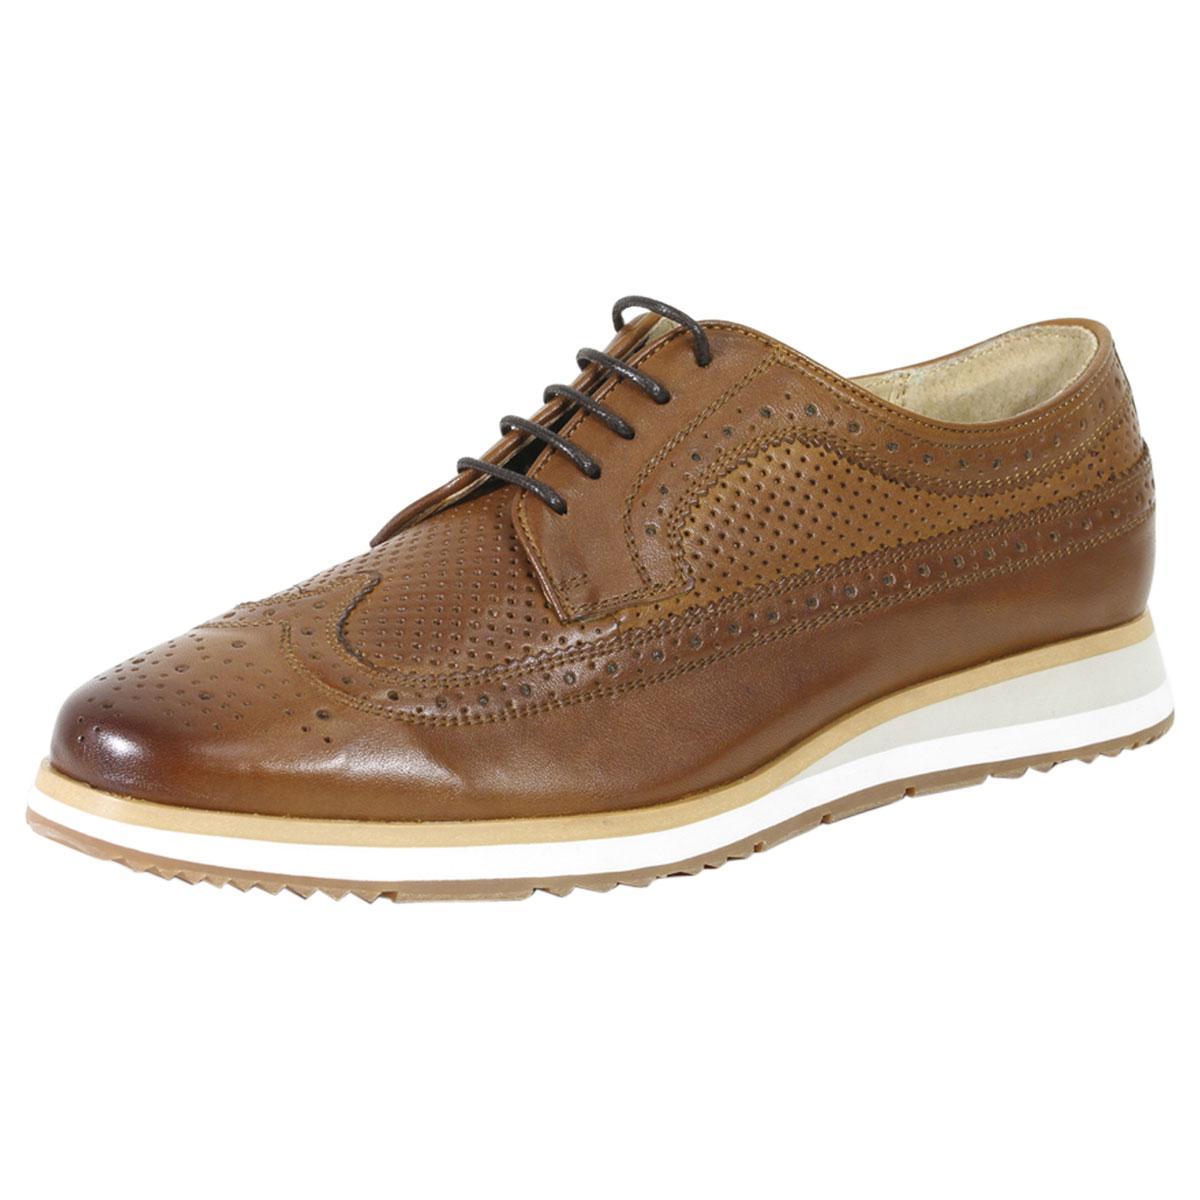 flux florsheim hommes chaussures aile oxfords chaussures hommes a43a11